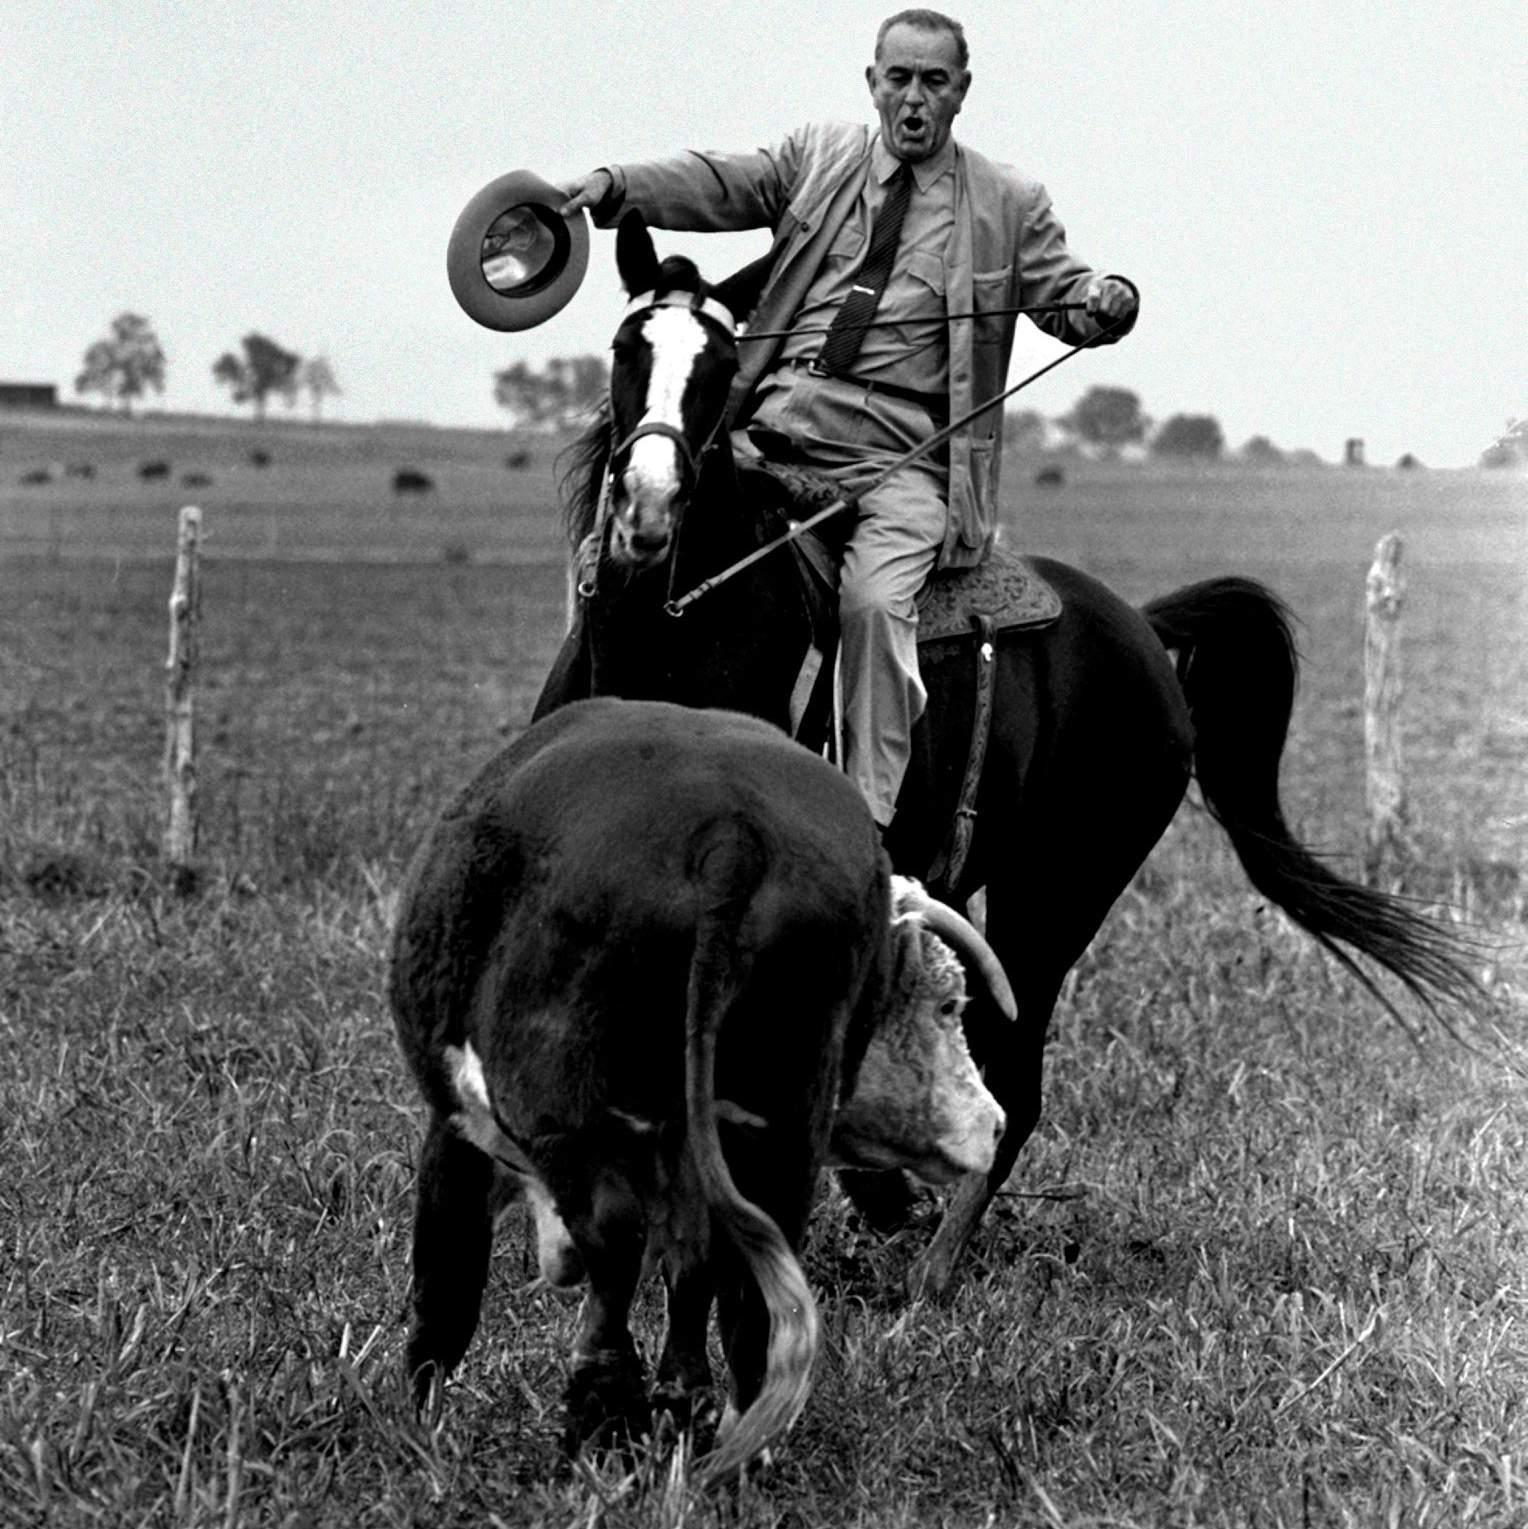 IMG_1928.JPG